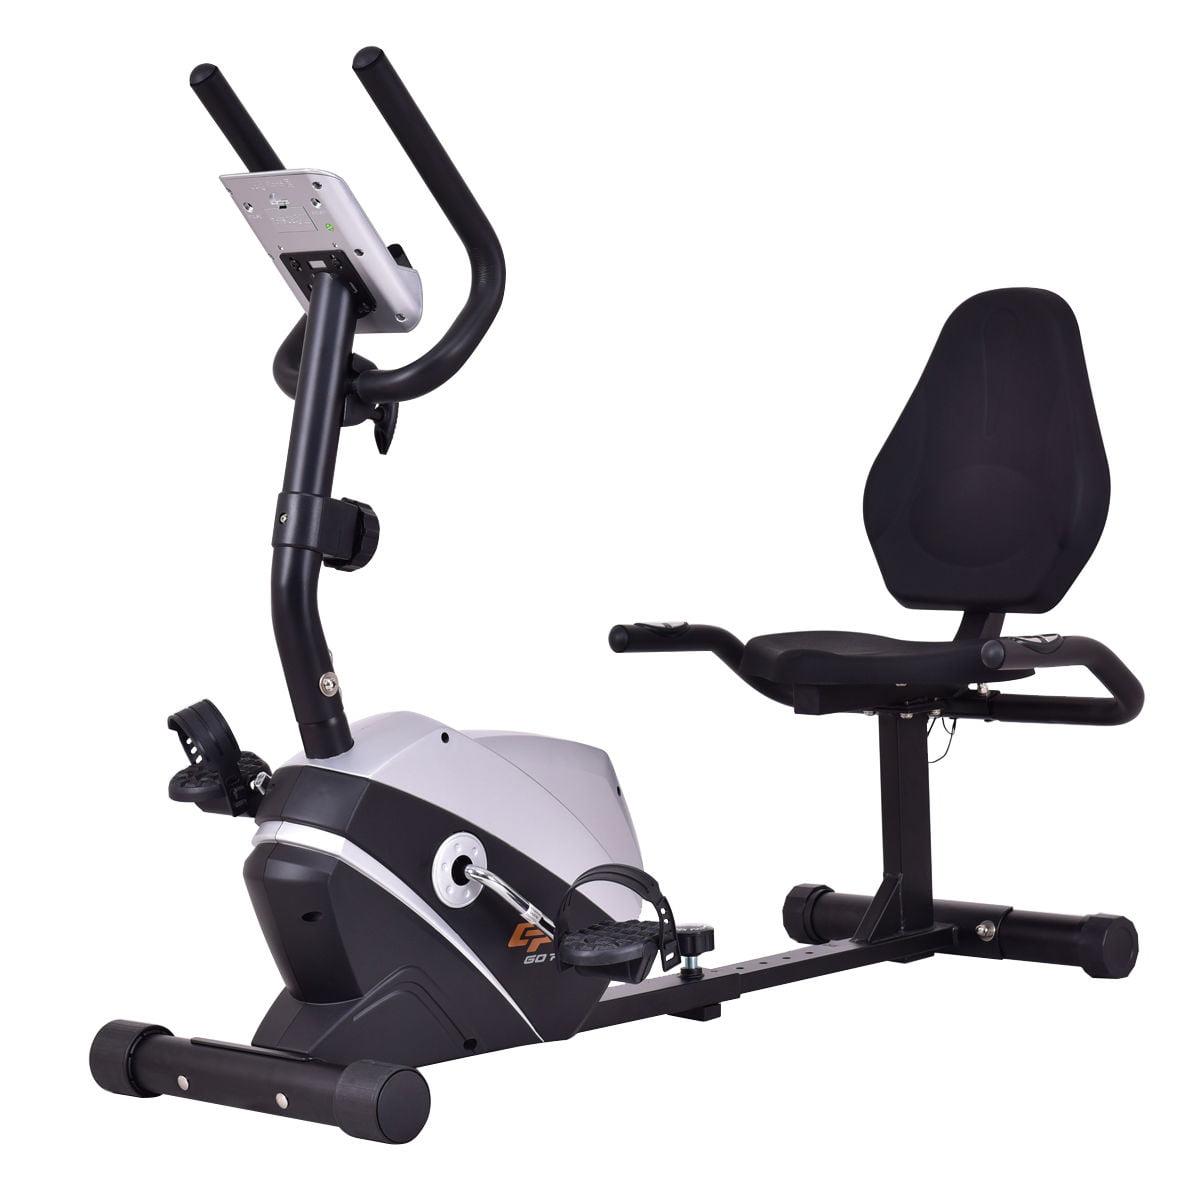 Goplus Recumbent Exercise Bike Stationary Bicycle Magnet Cardio Workout Fitness